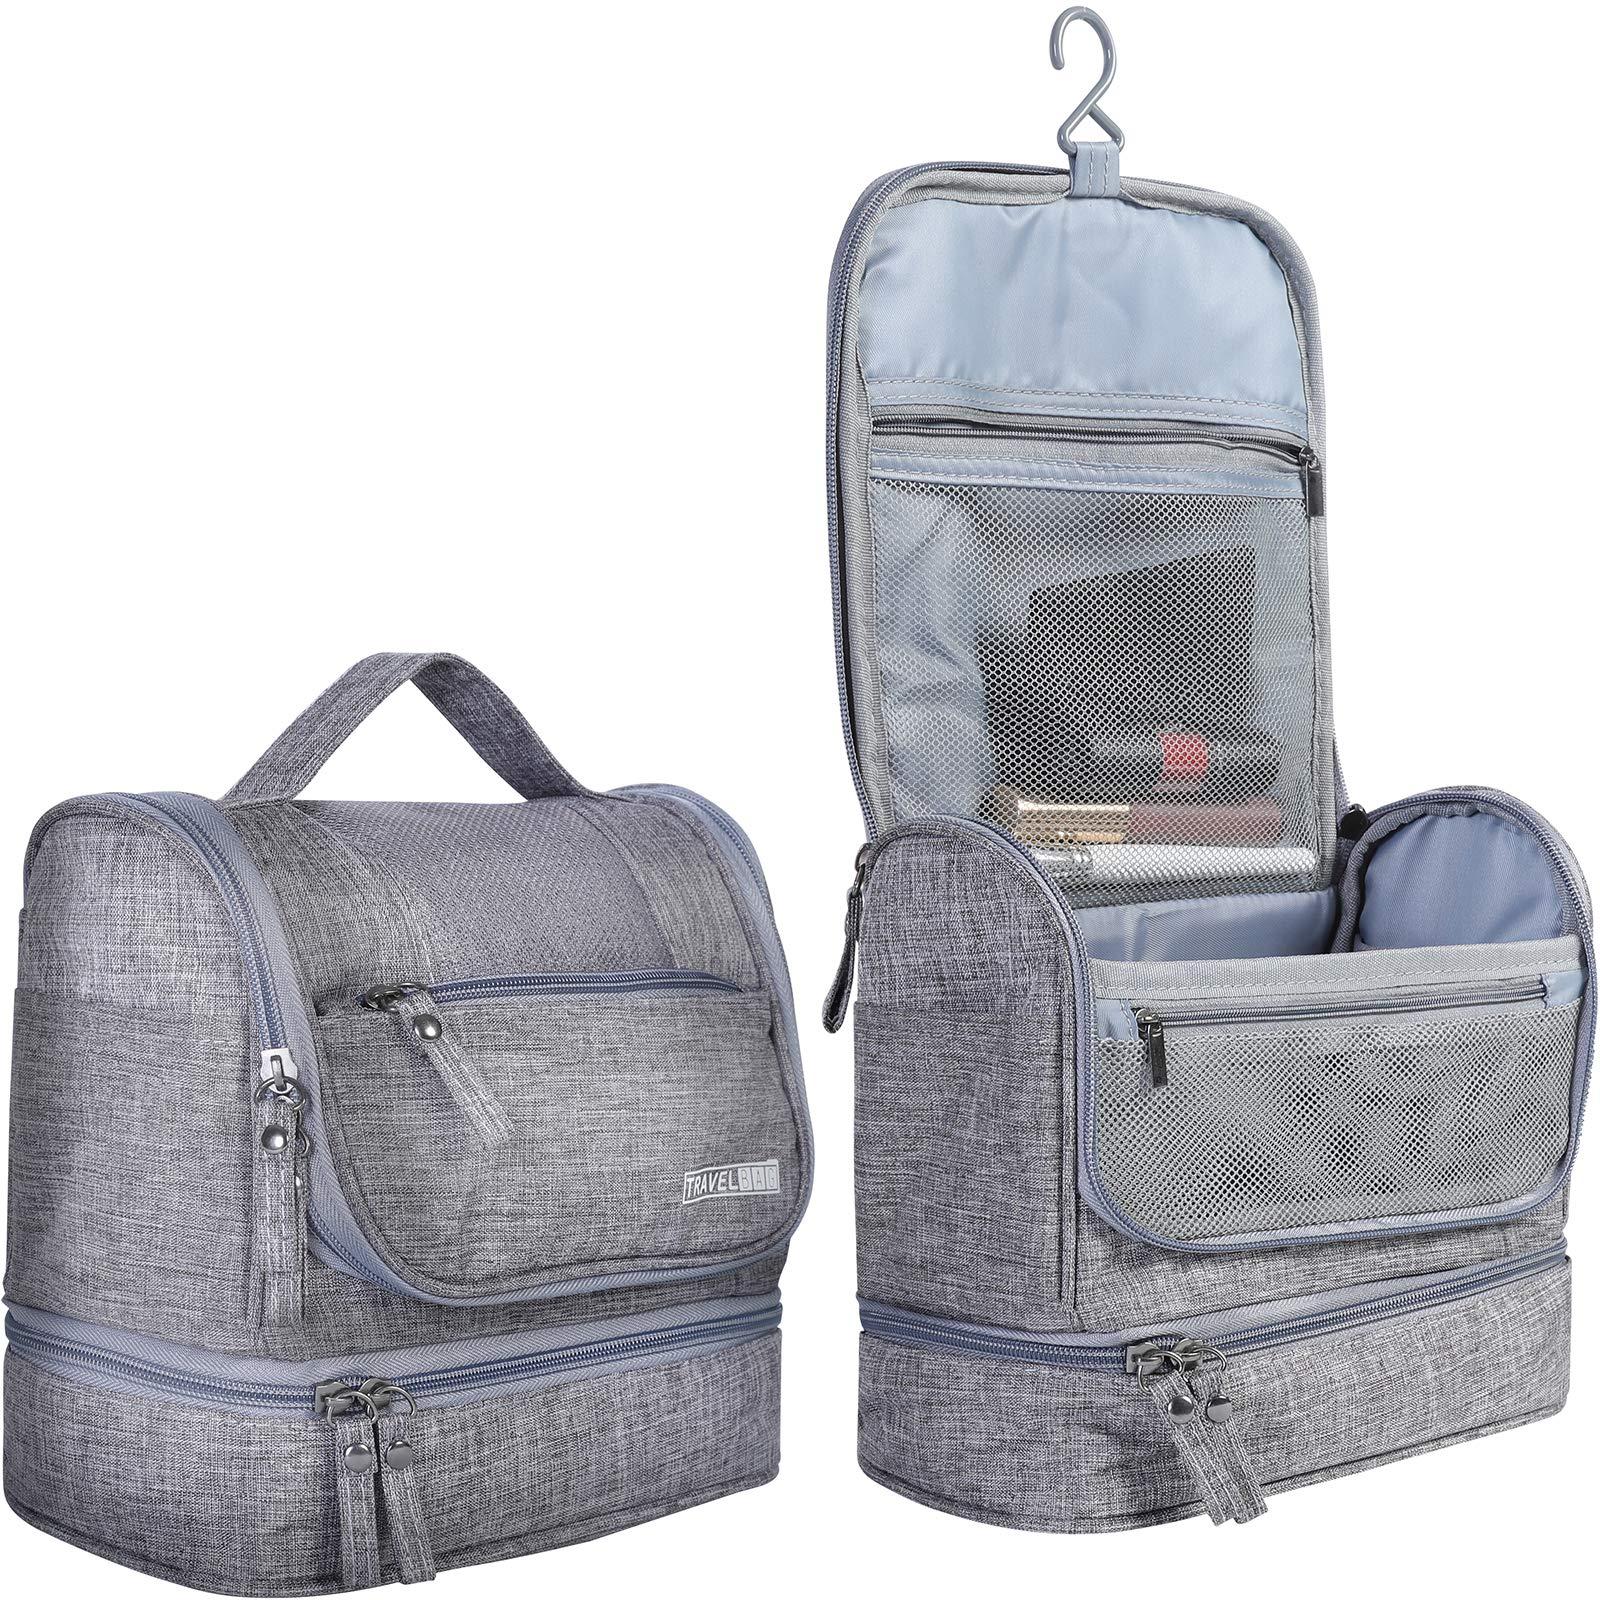 HOKEMP Toiletry Bag Travel Waterproof Cosmetic Bag Multifuncation Organizer Bag Portable Makeup Pouch - Gray